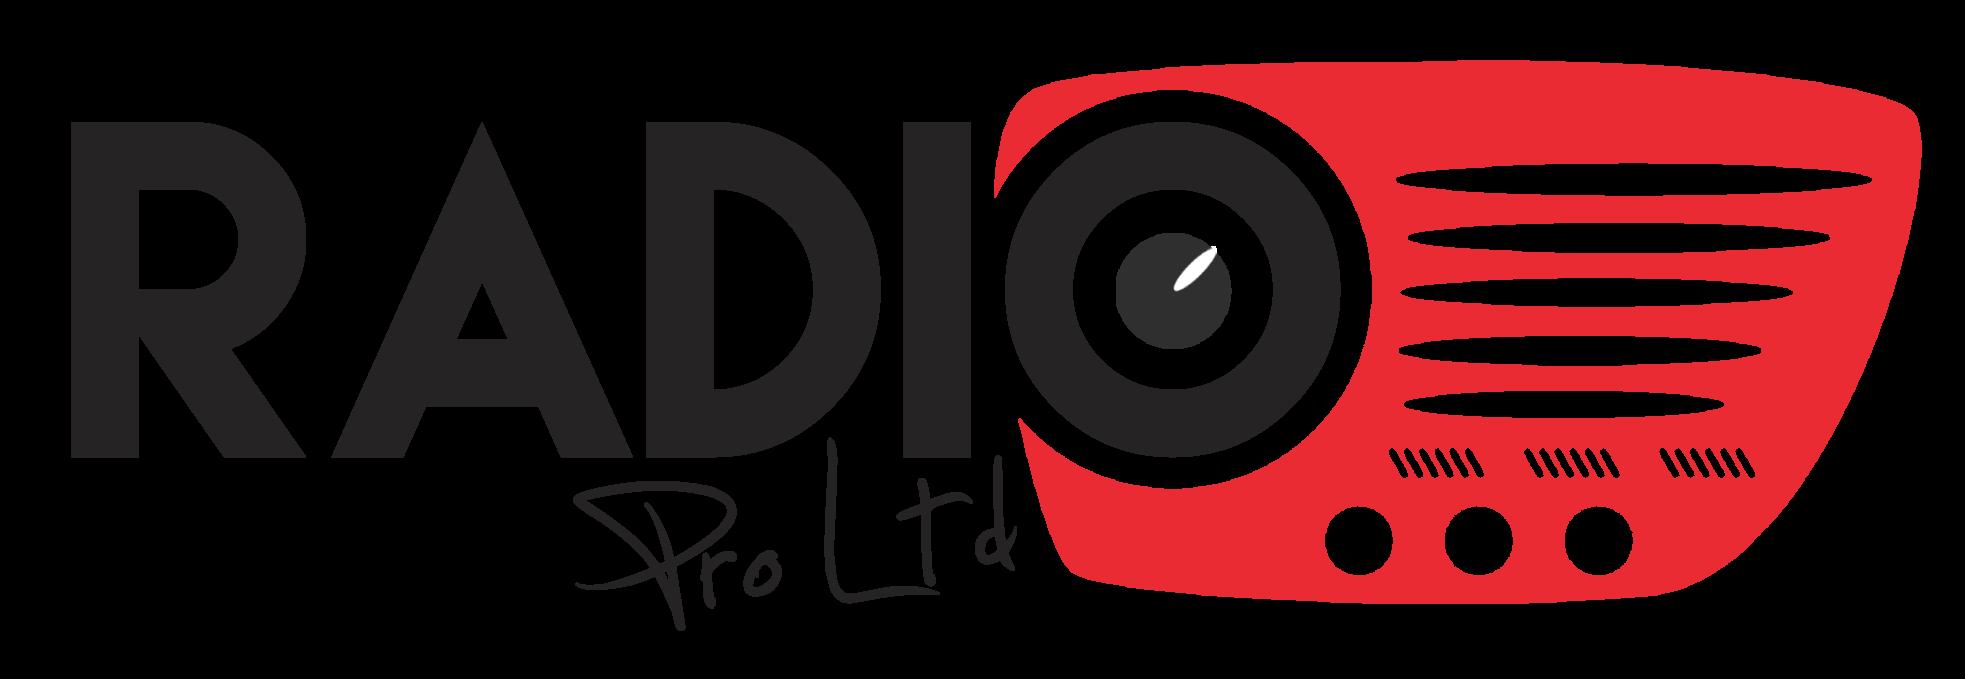 RadioPro Ltd | Collective Management Organisation in the UK